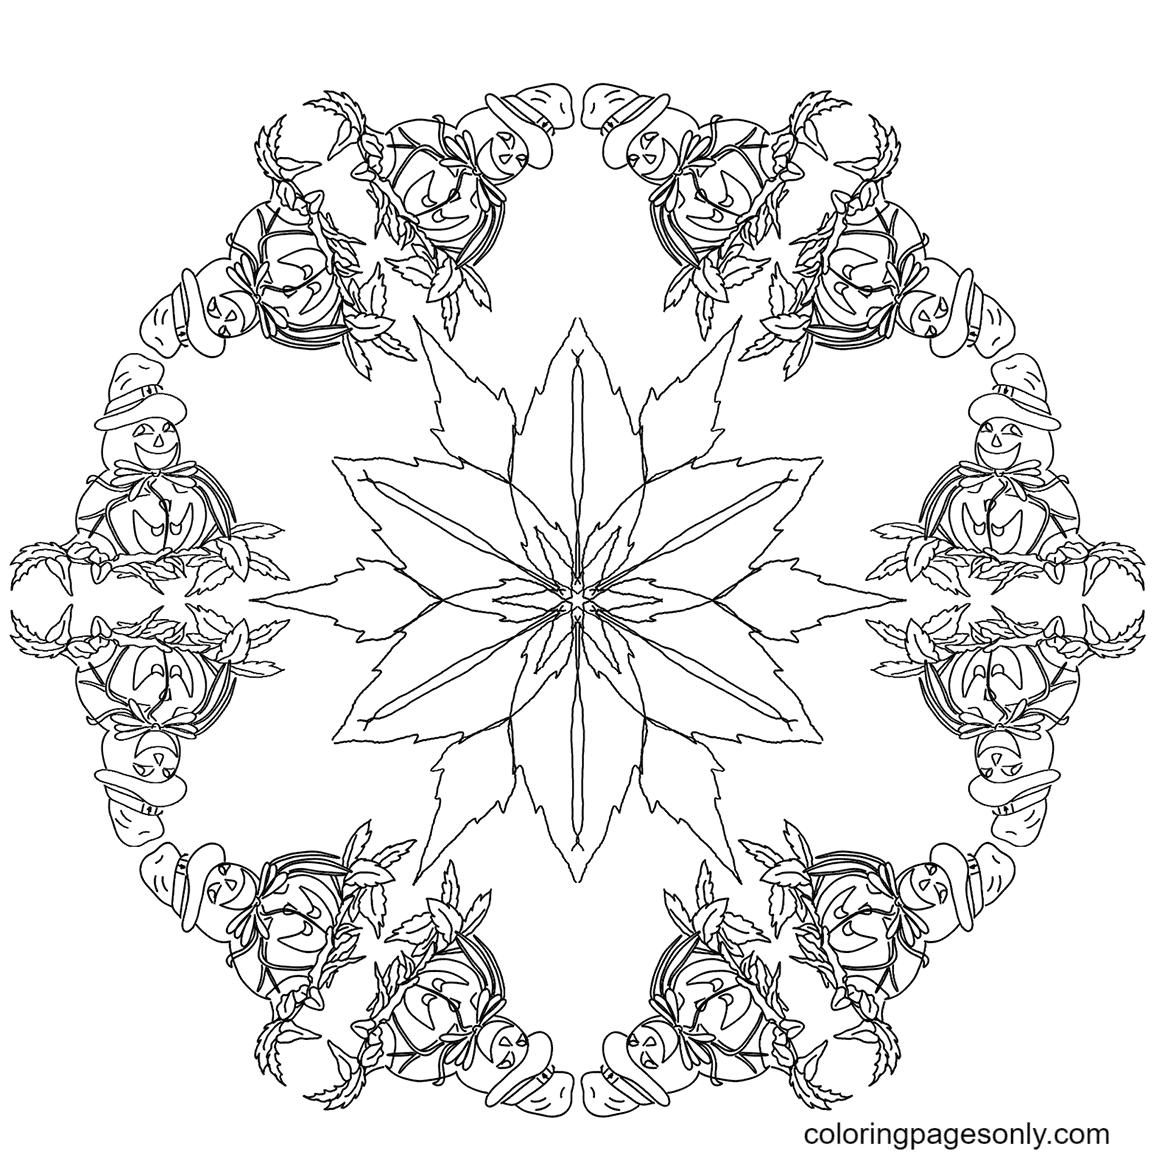 Halloween Mandala with Pumpkins Printable Coloring Page